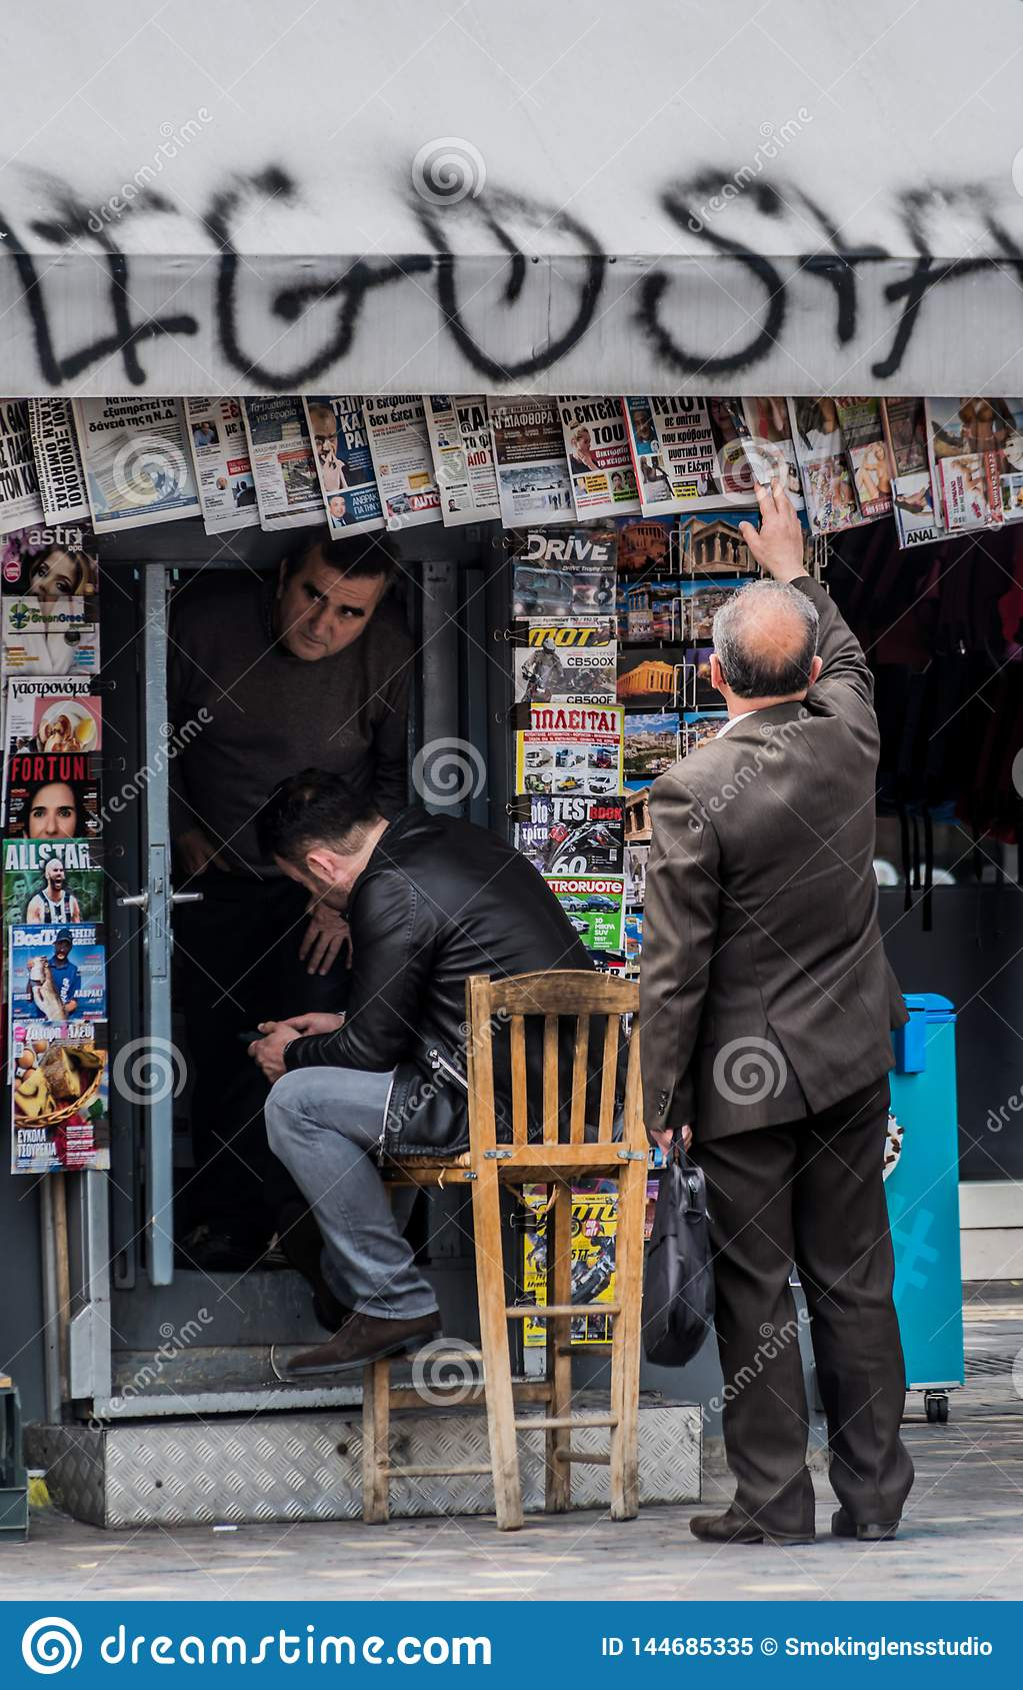 Krantentribune, Monastiraki, Atyhens, Griekenland